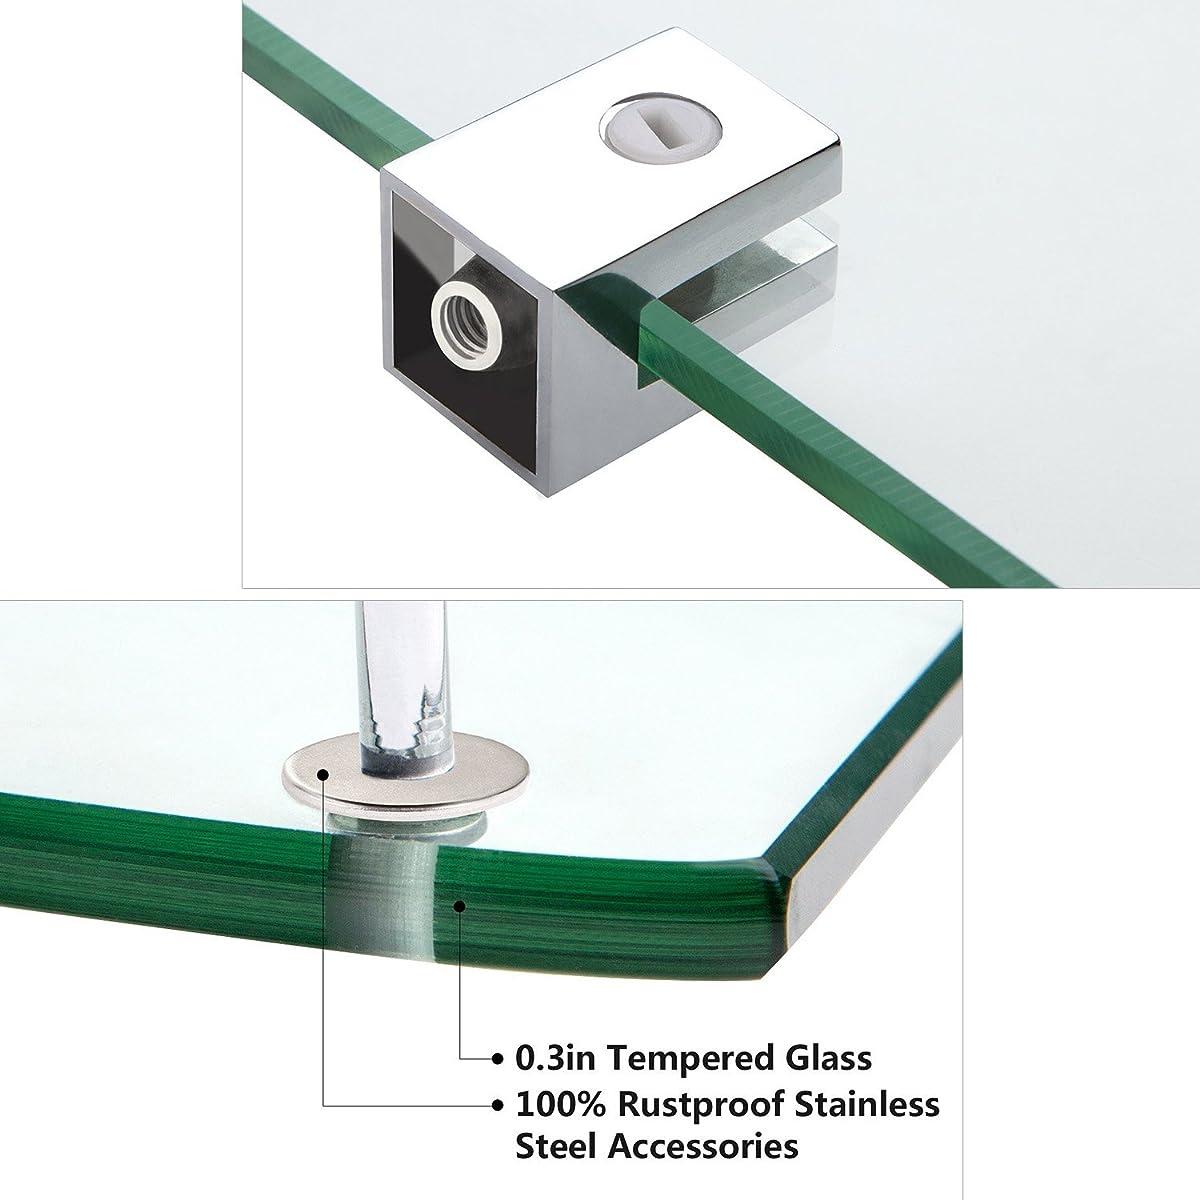 Bathroom Tempered Glass Corner Shelf, Vdomus Stainless Steel Shower Shelf with Rail, Polished Chrome